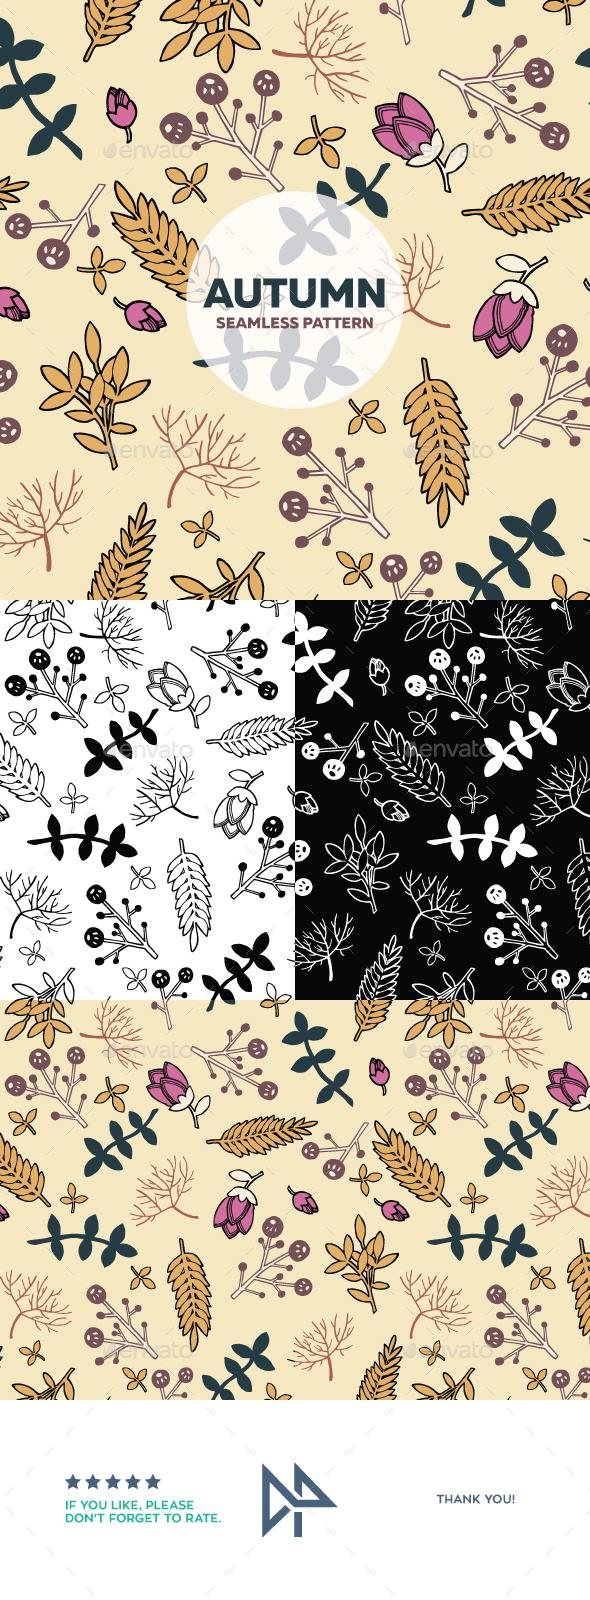 Autumn seamless pattern - Seasons Nature